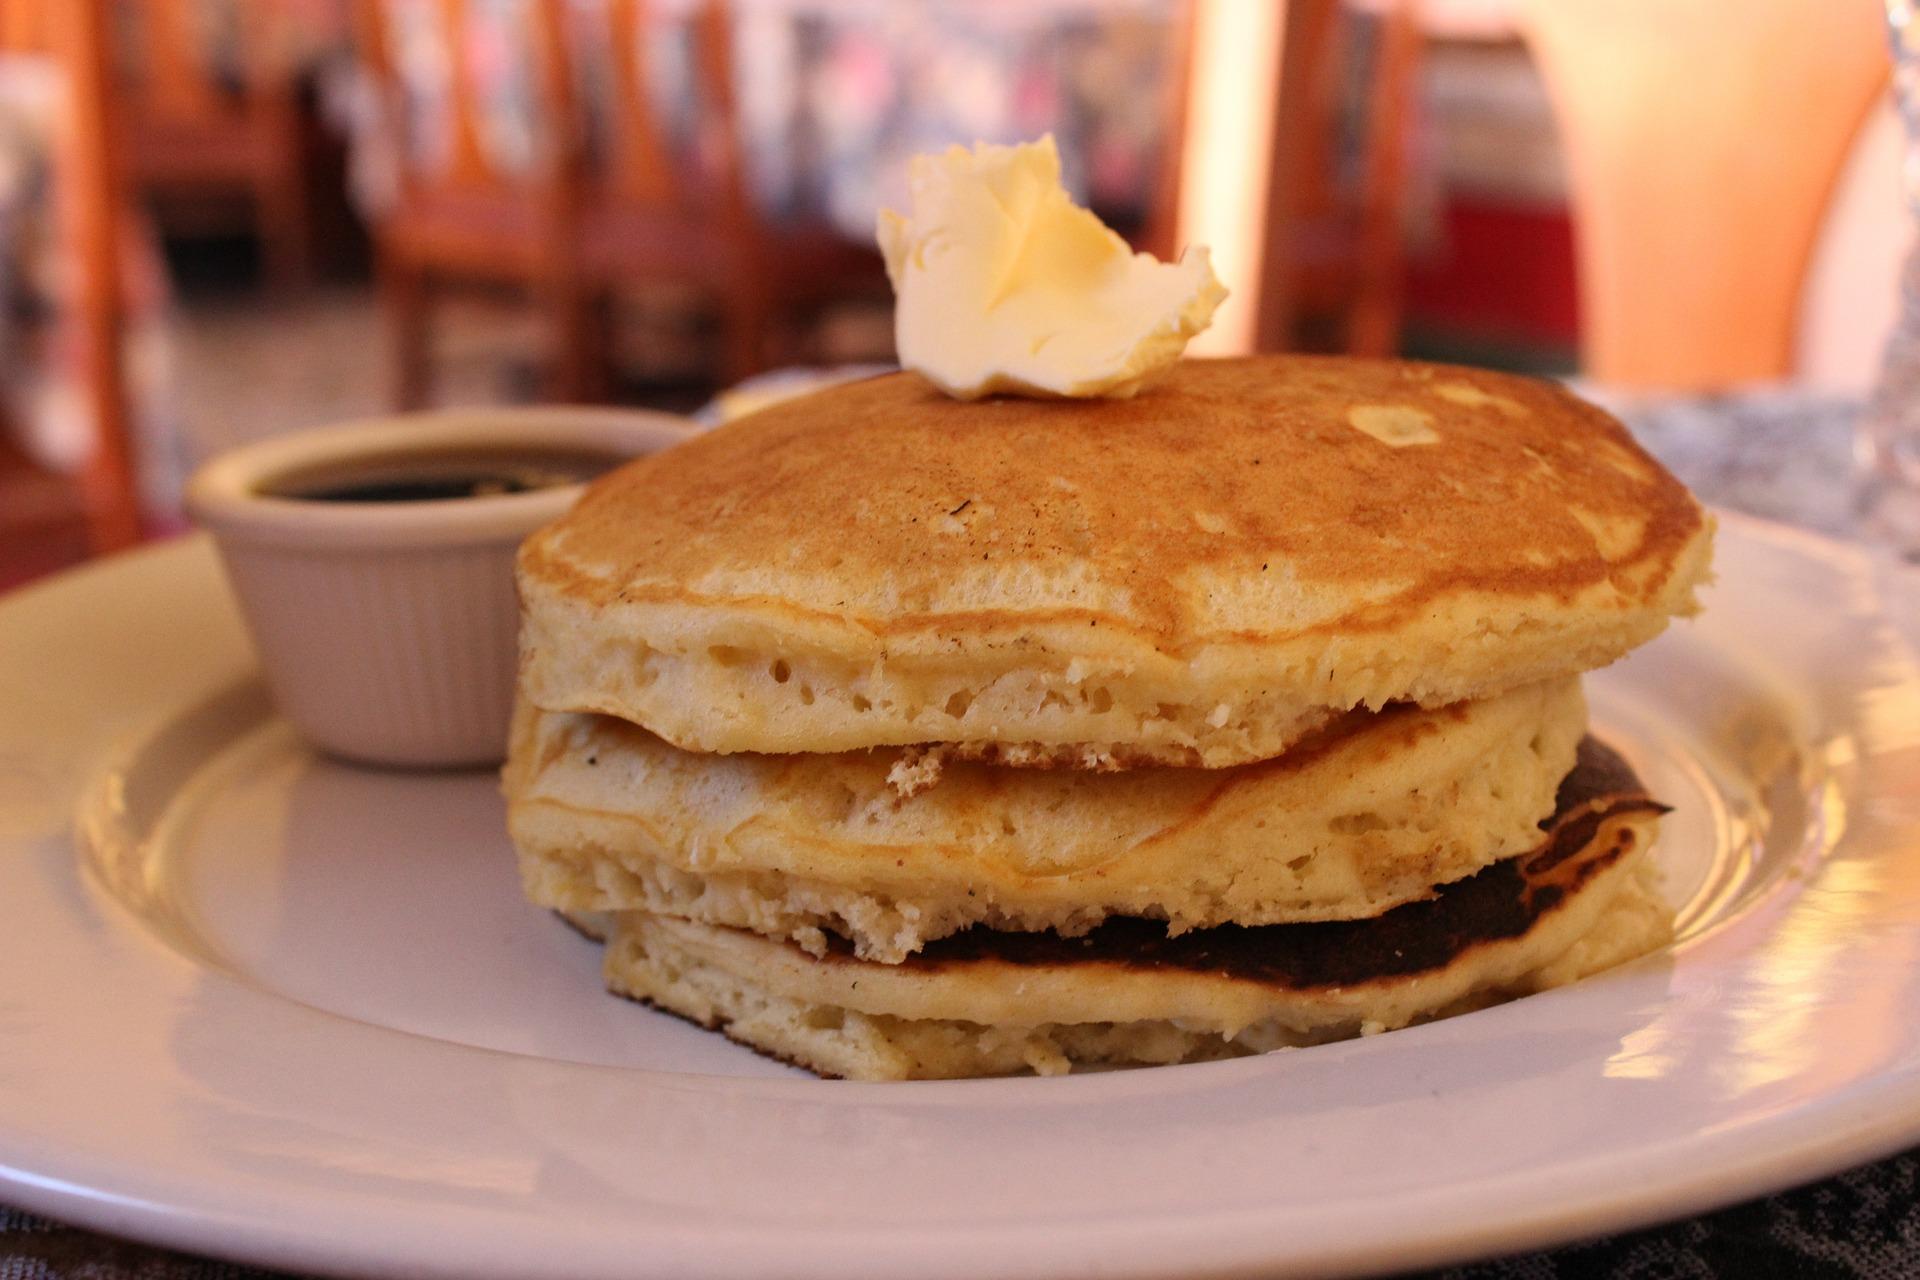 Best Pancake Recipes: Homemade Pancakes